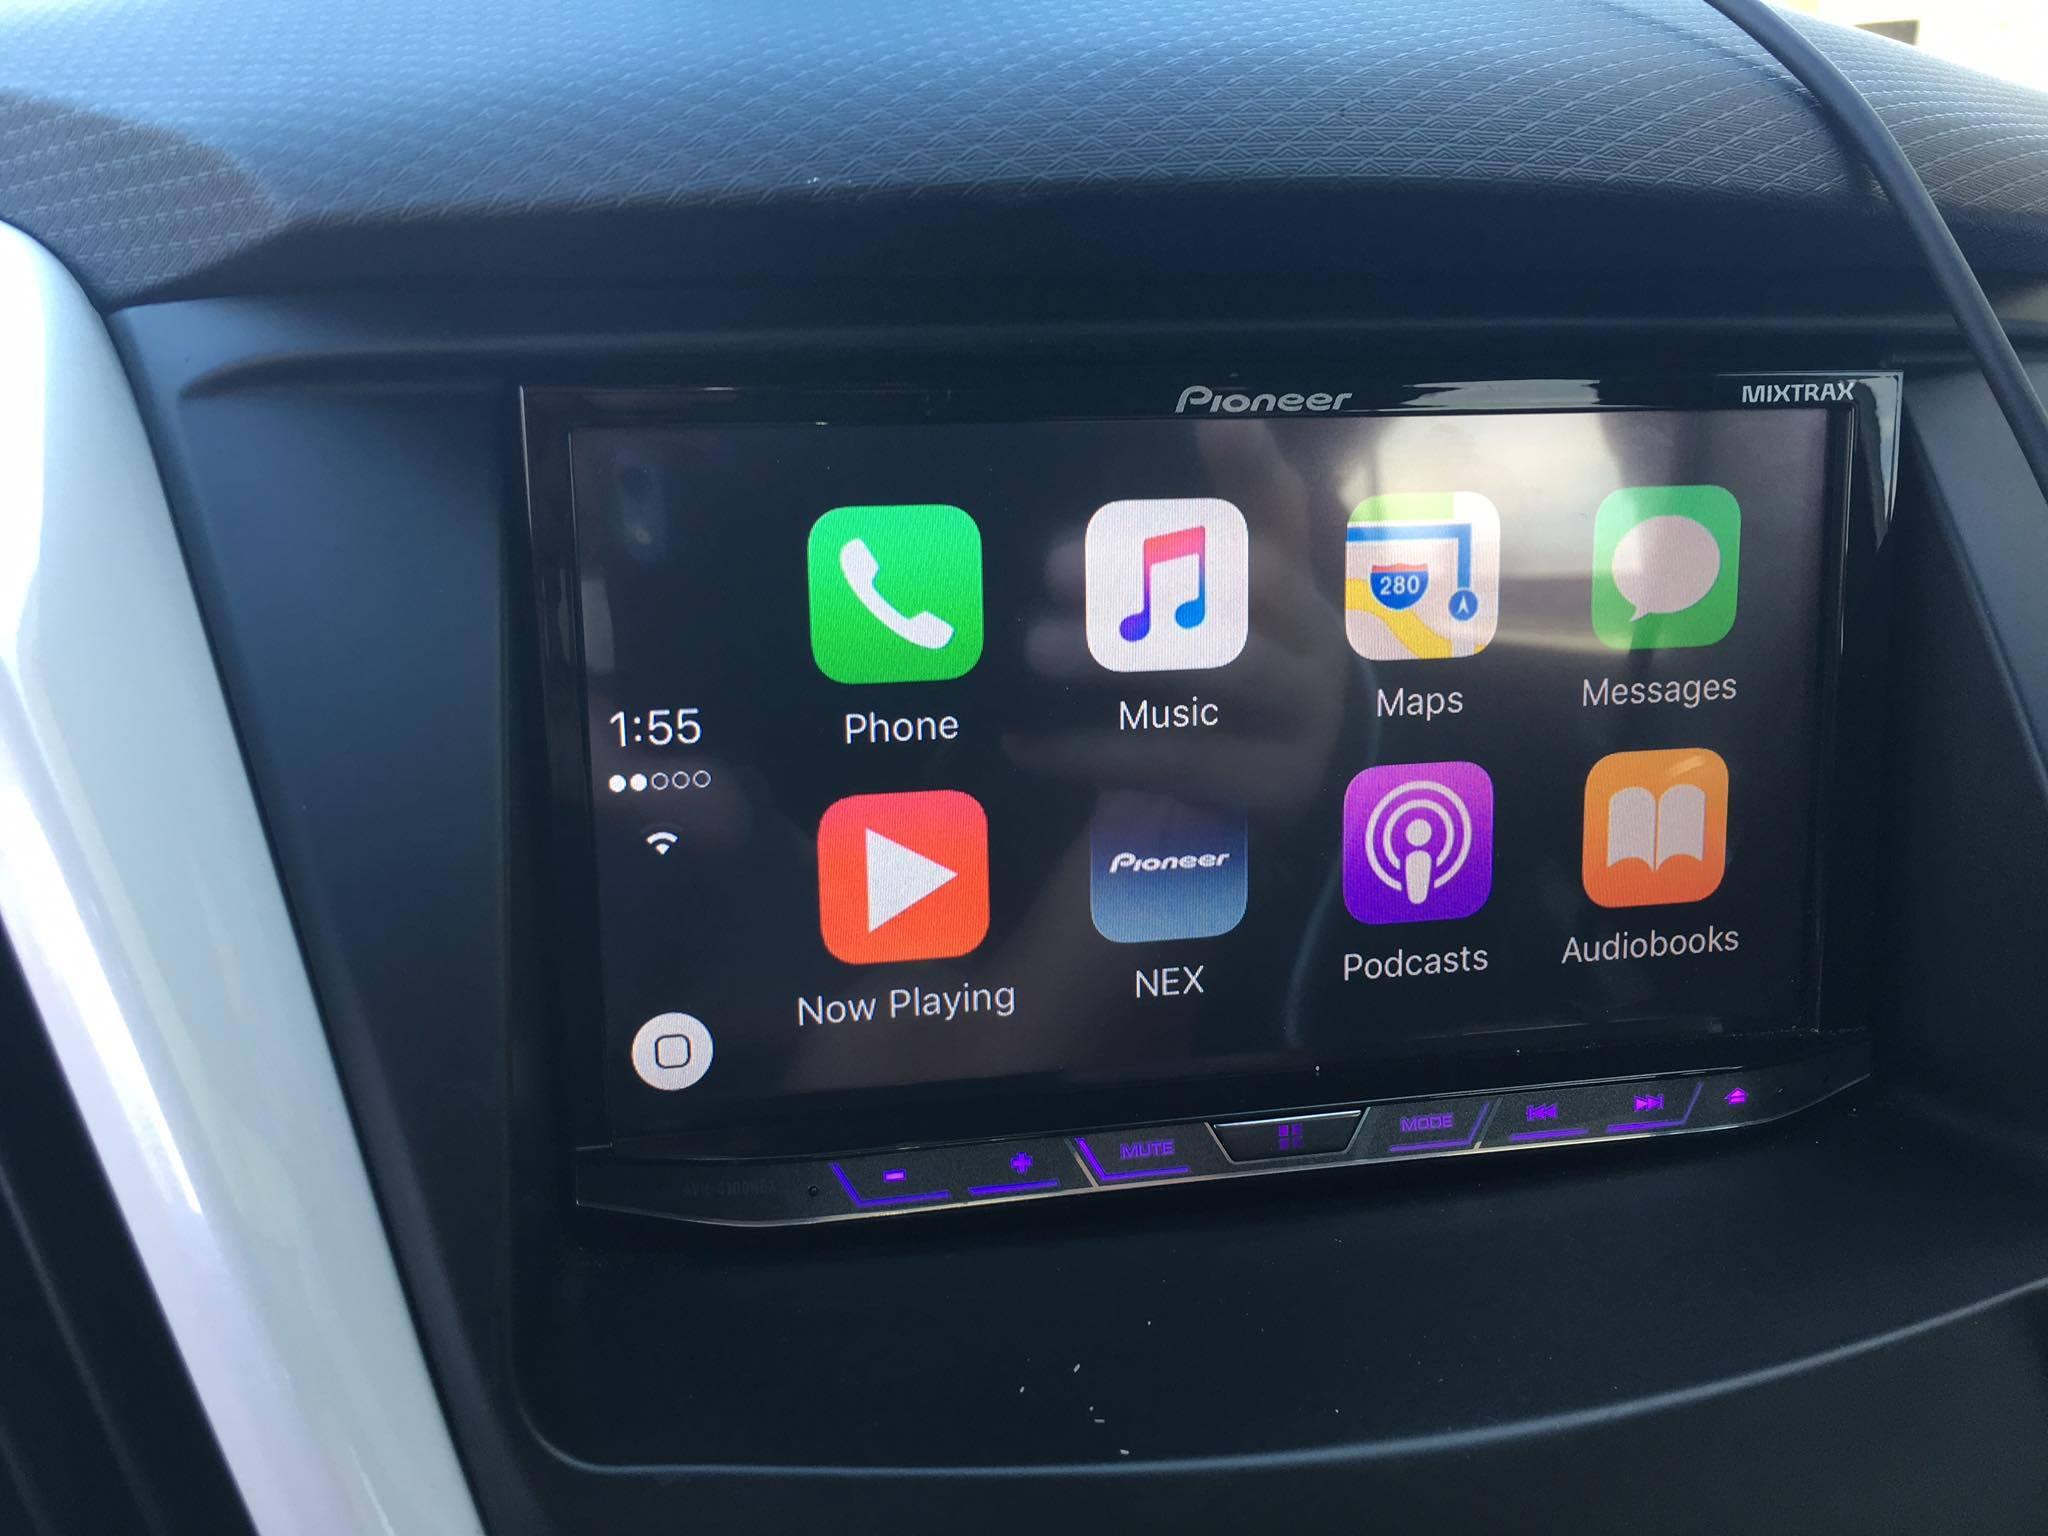 Hankook Ventus V12 Evo2 >> Carplay+bluetooth head unit recommendations